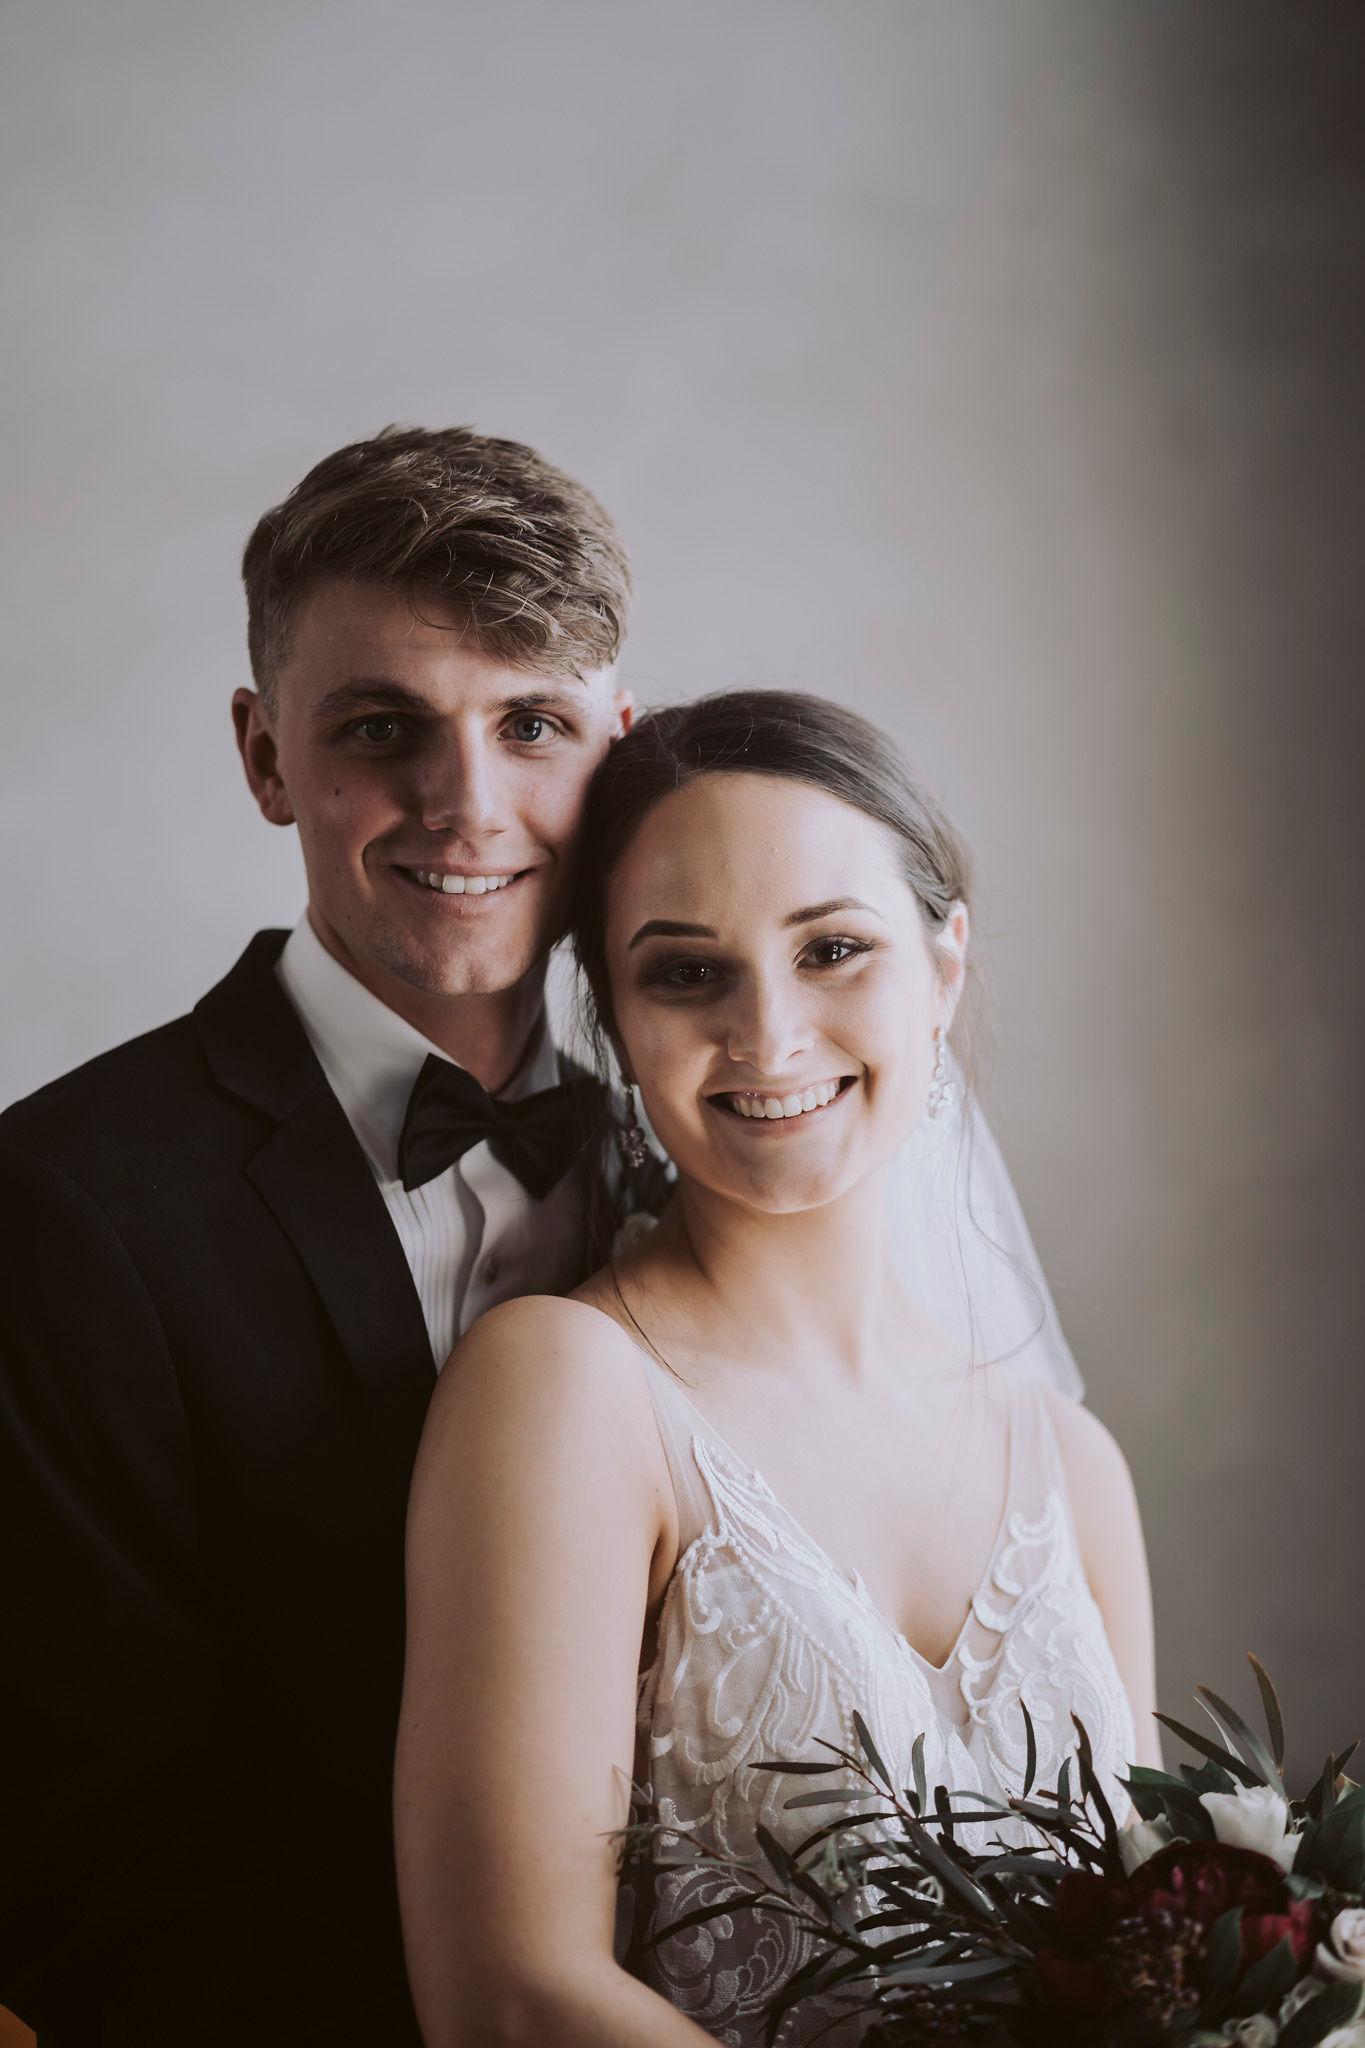 New Zealand Wedding Photographer David Le Design &Amp; Photographywww.davidle.co.nz